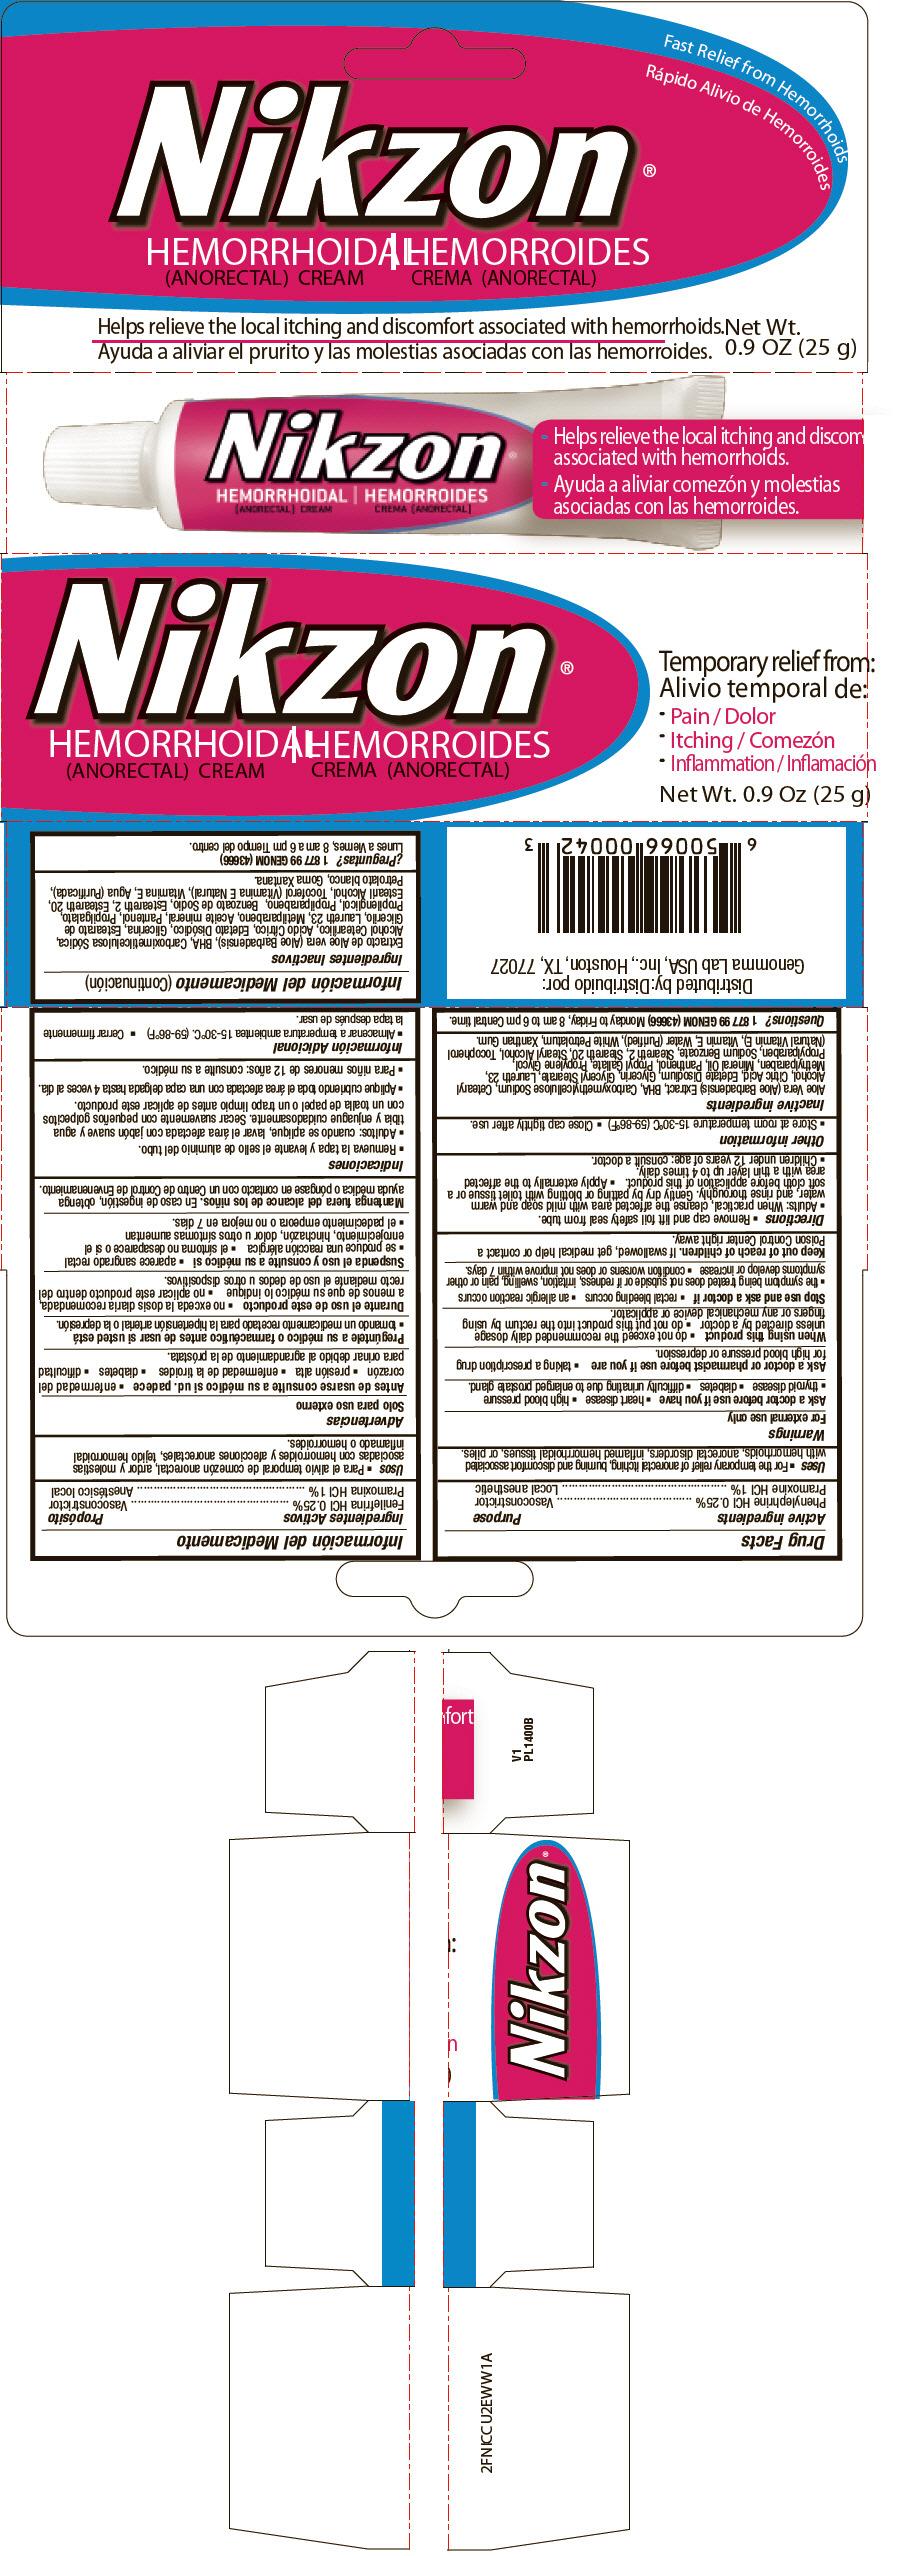 Nikzon Hemorrhoidal   Phenylephrine Hydrochloride And Pramoxine Hydrochloride Cream while Breastfeeding